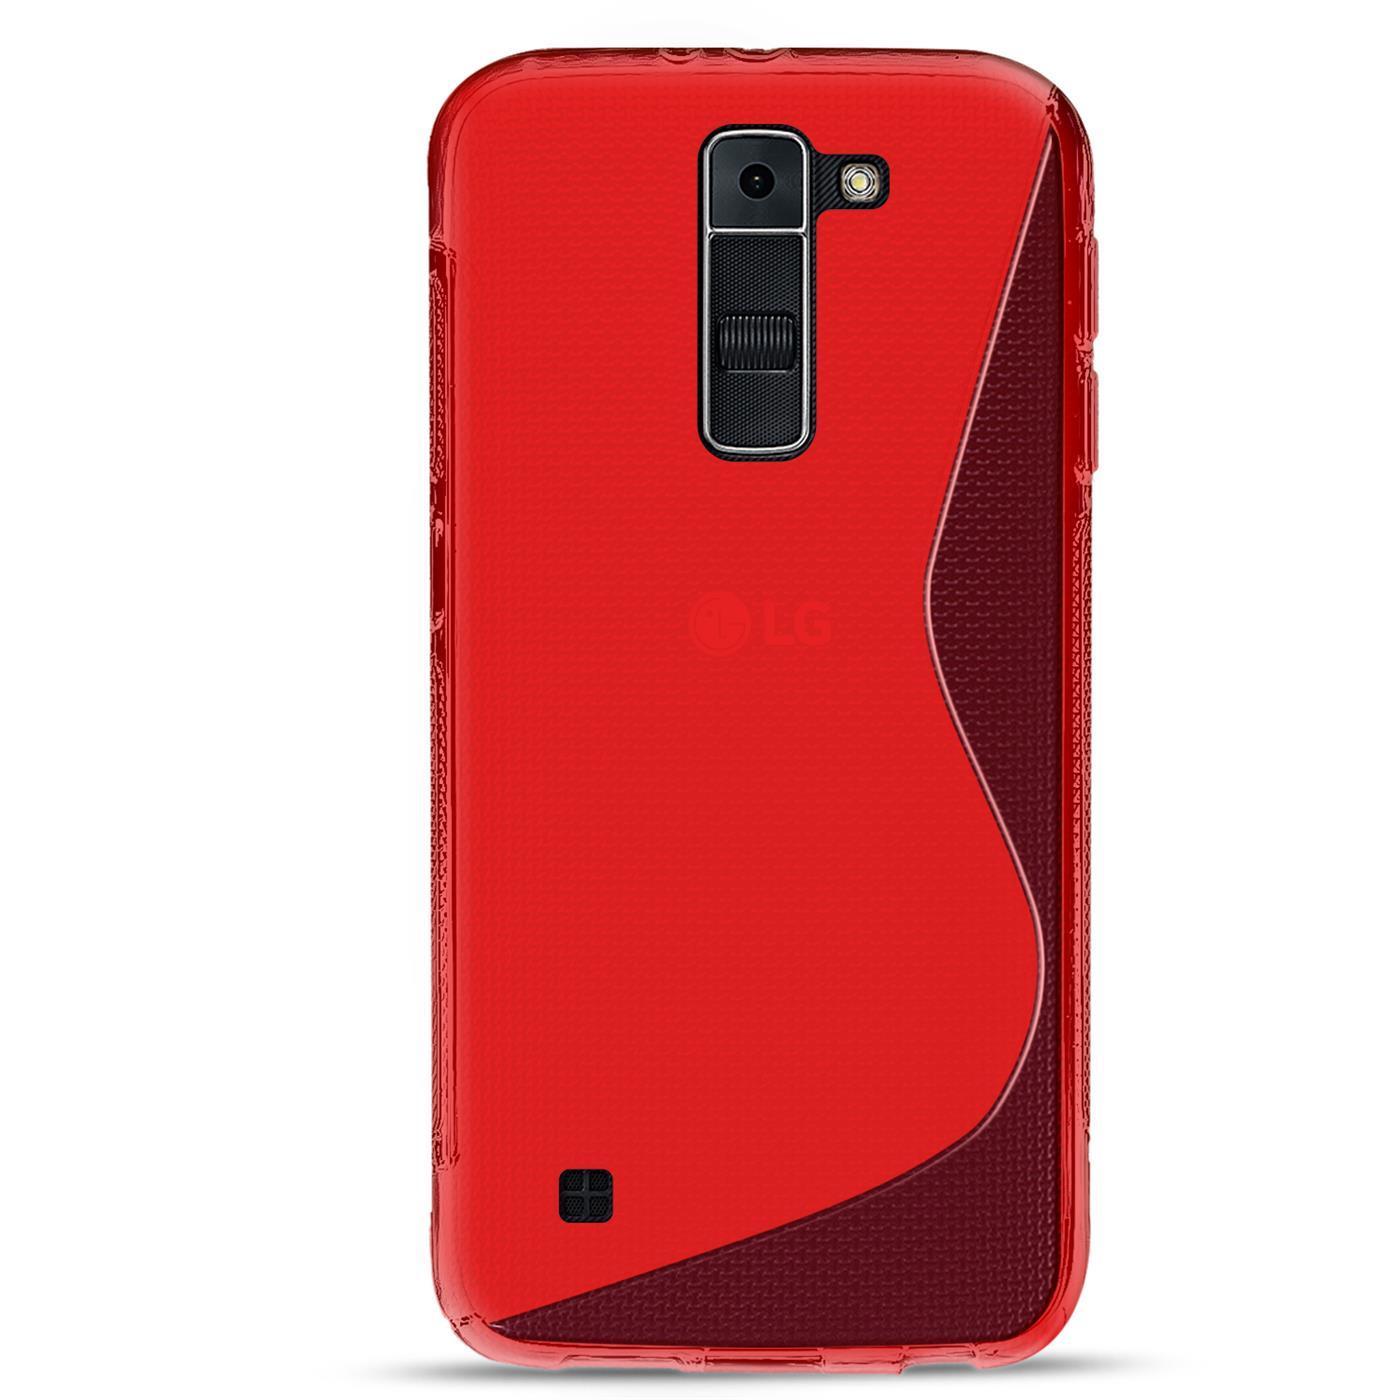 LG-Leon-LTE-Silikon-Gel-S-Line-Case-Cover-Ultra-Thin-Slim-Back-Bumper Indexbild 17